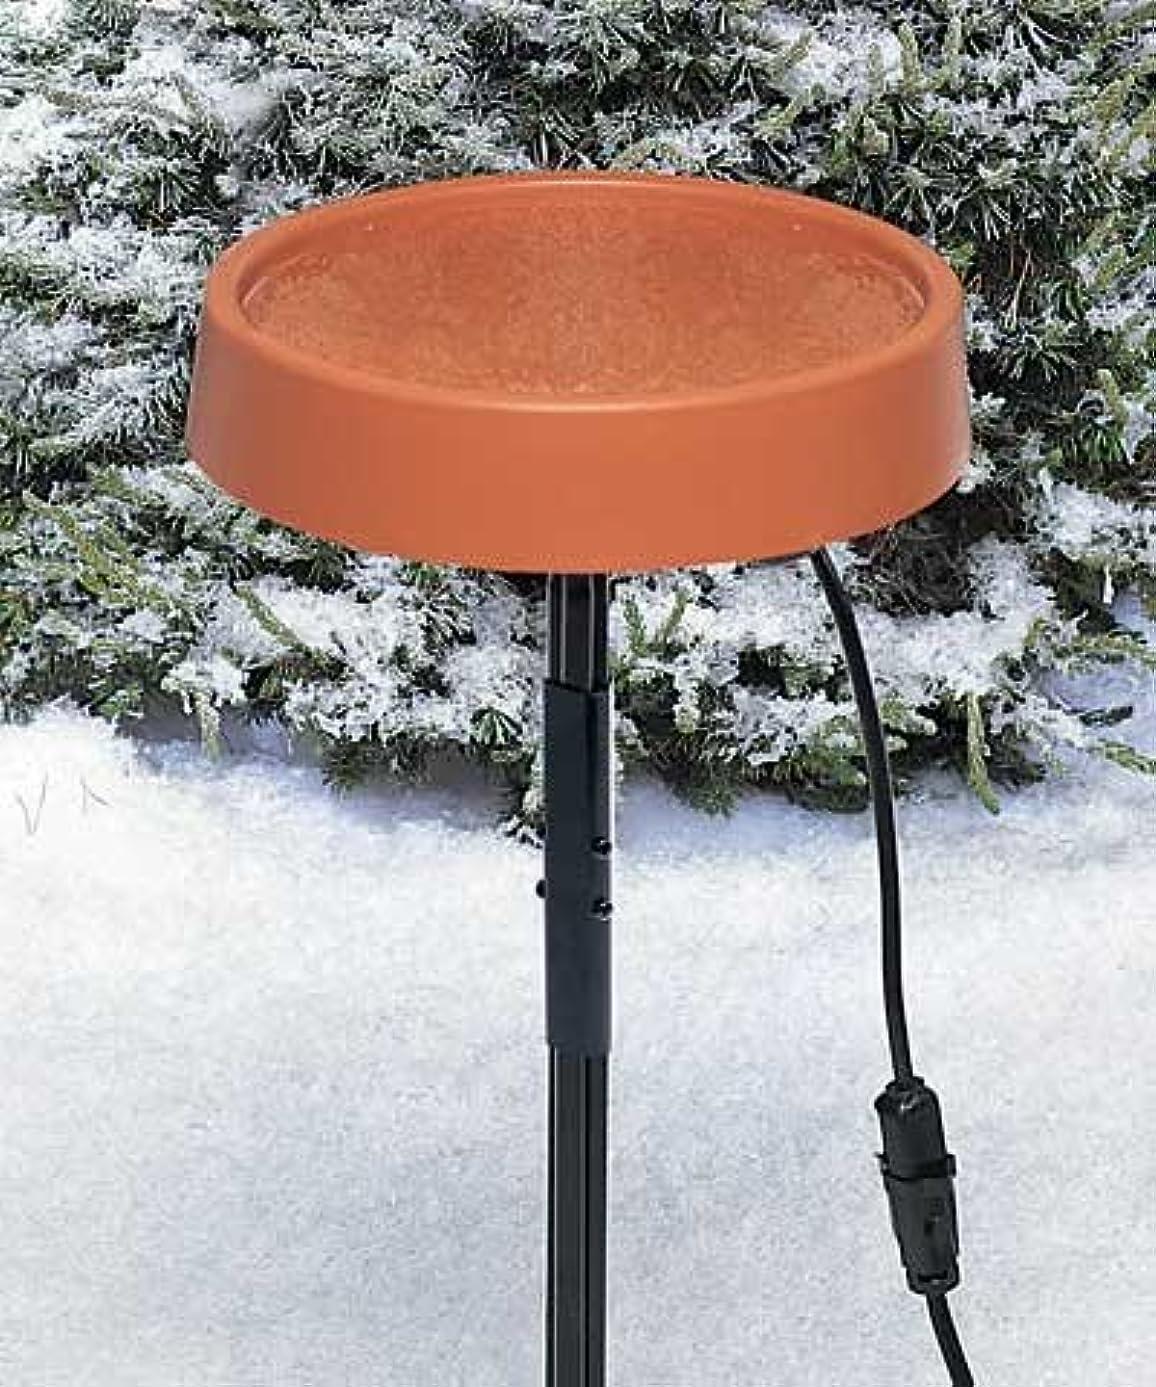 Allied Precision Heated Bird Bath with Metal Stand, Terra Cotta